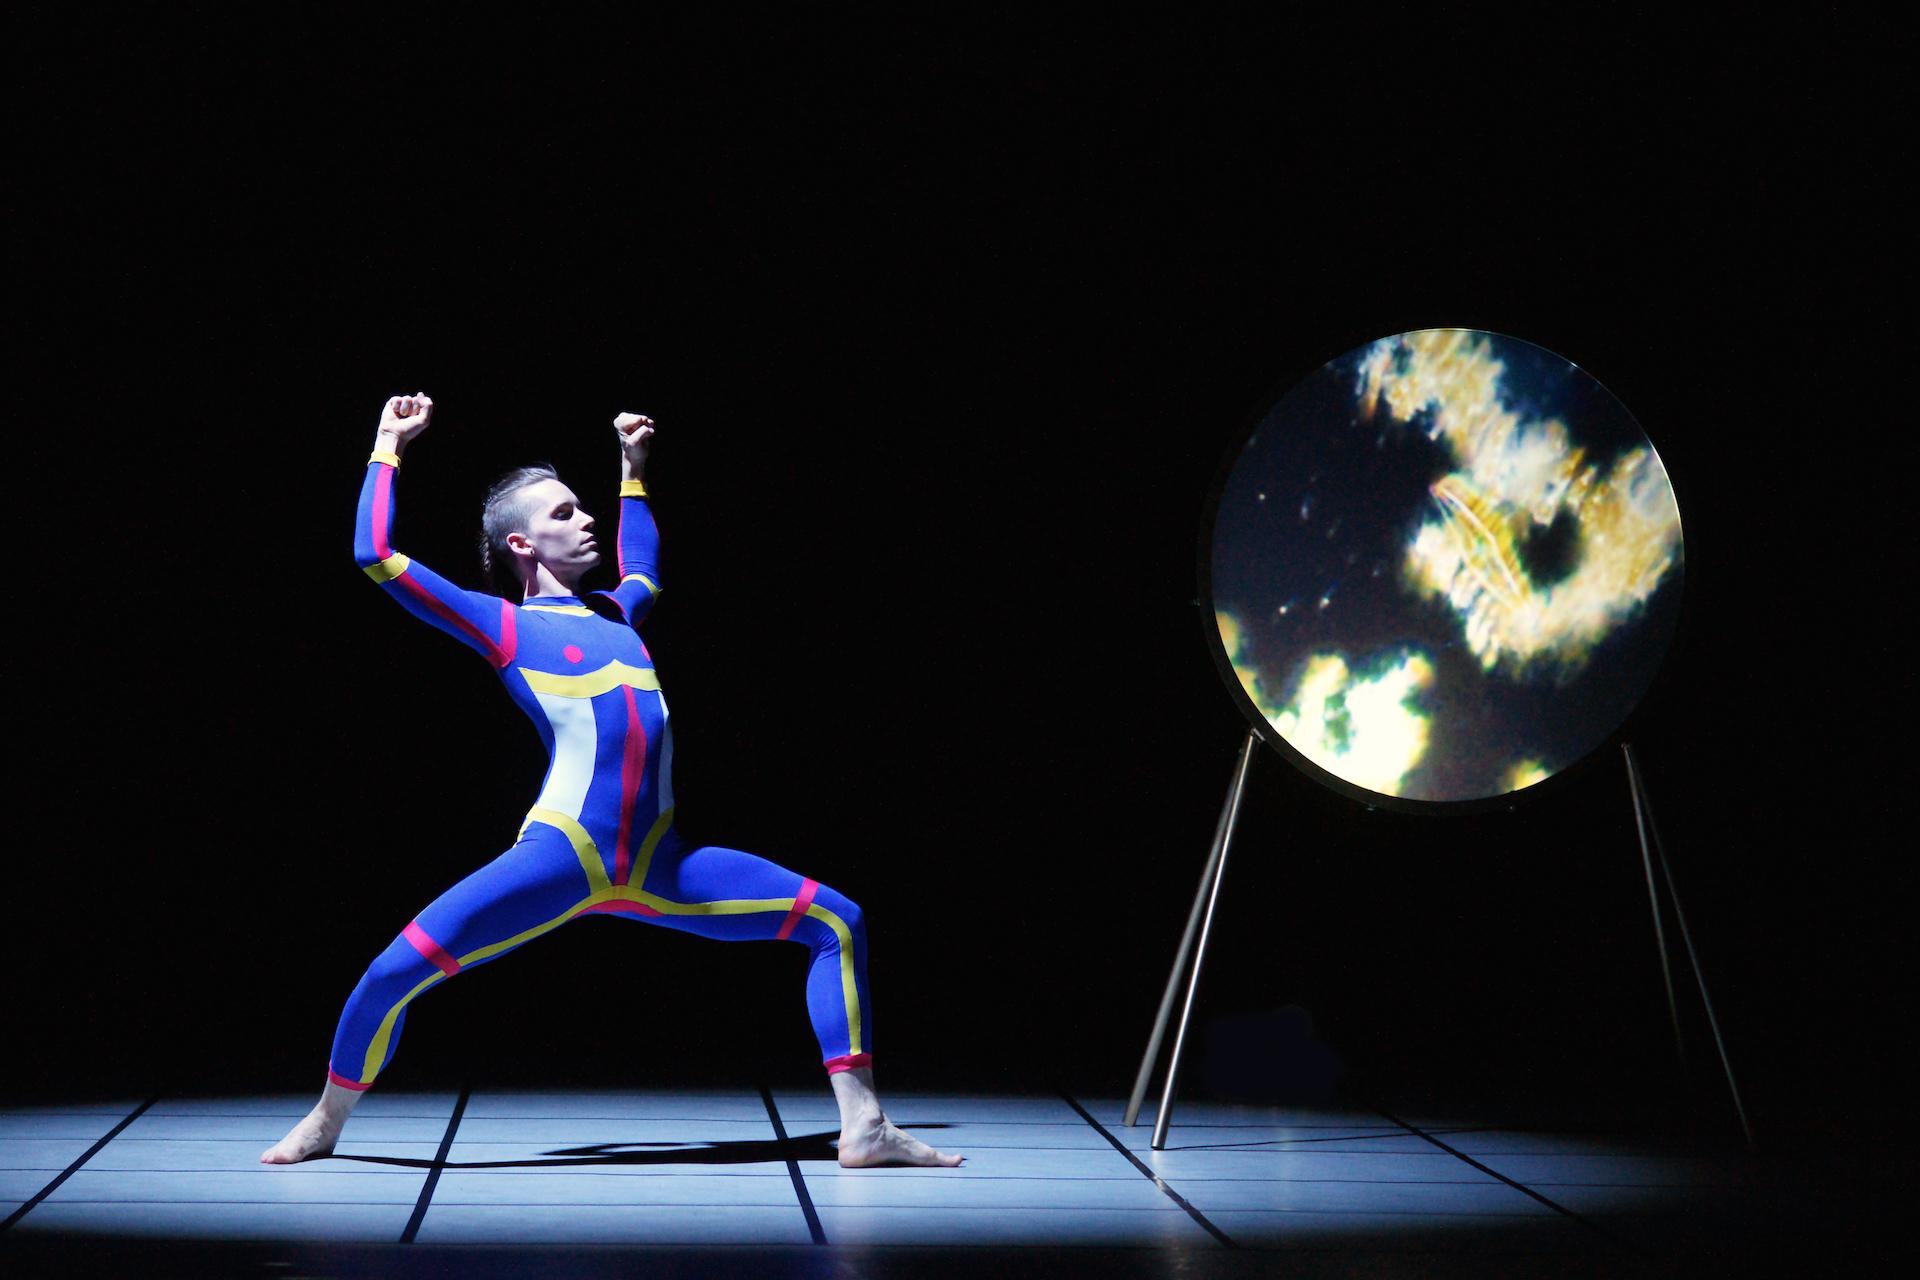 Nicola Galli / Deserto digitale / TIR Danza